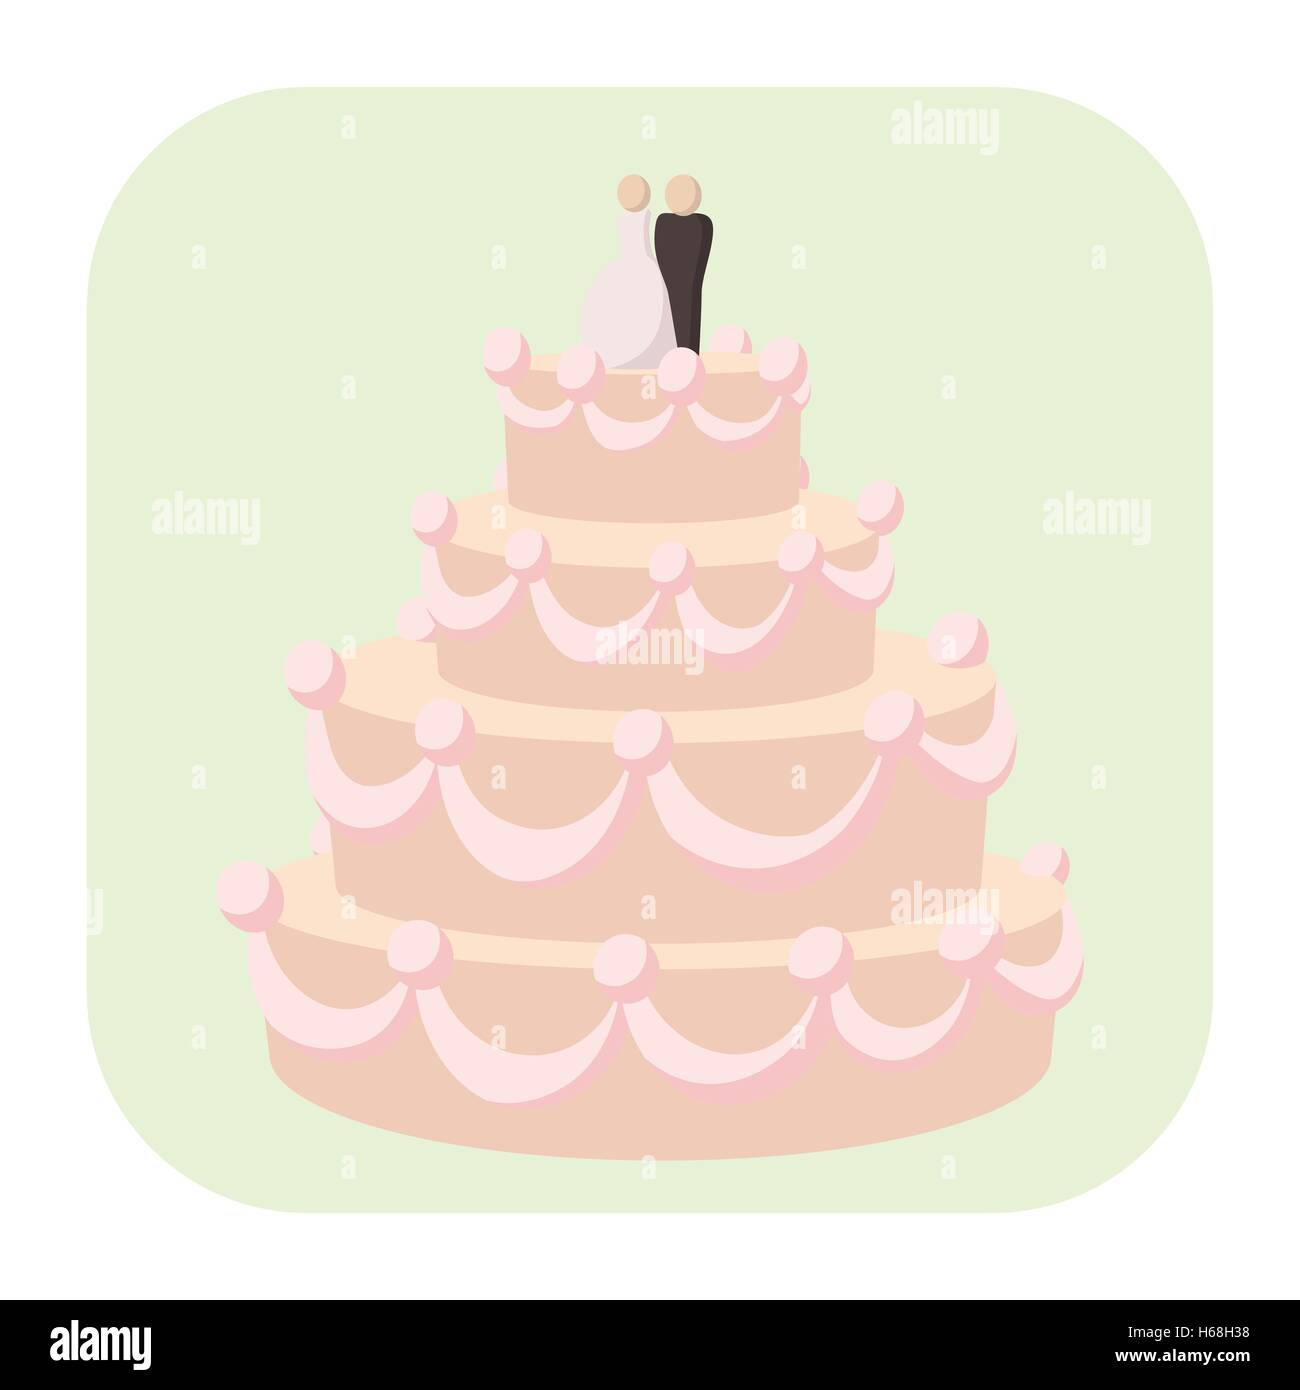 Hochzeitstorte Cartoon Symbol Vektor Abbildung Bild 124349548 Alamy